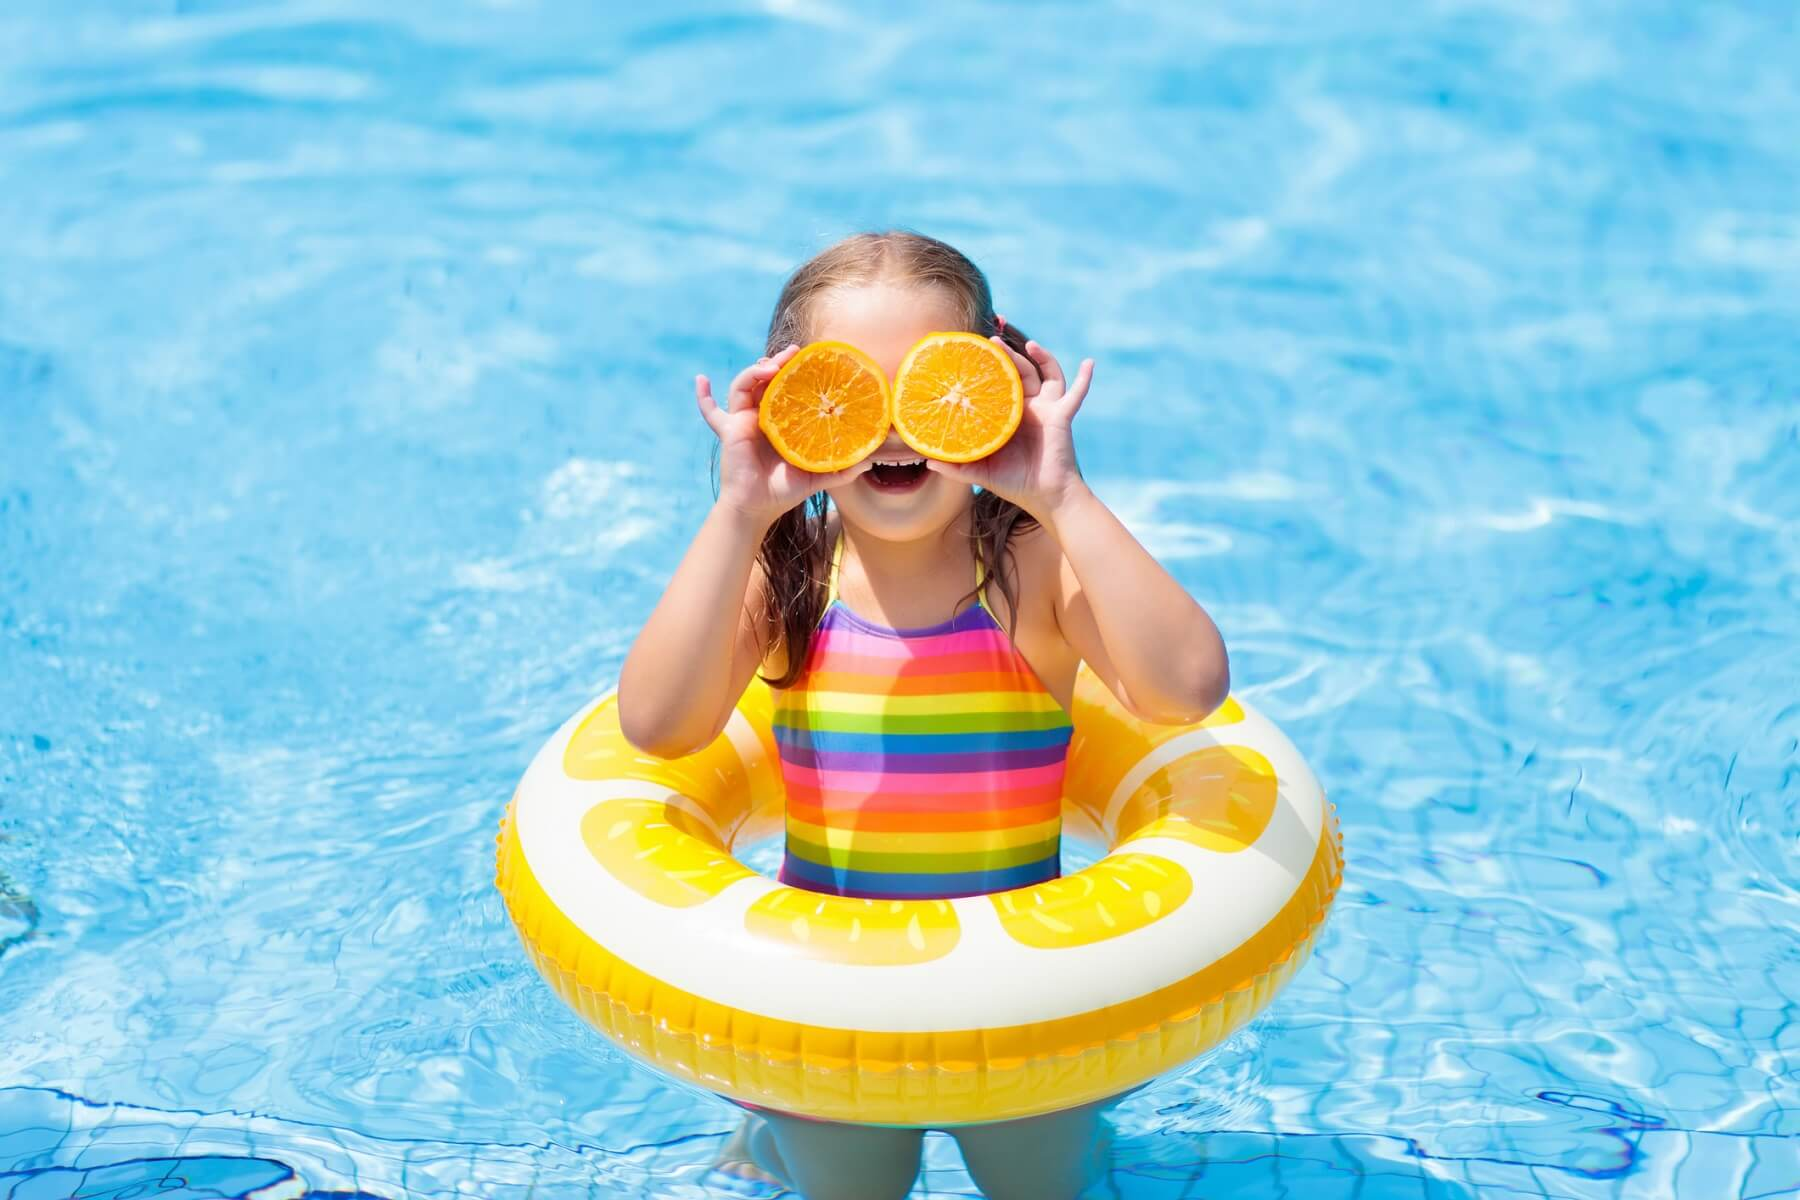 child kid swimming pool